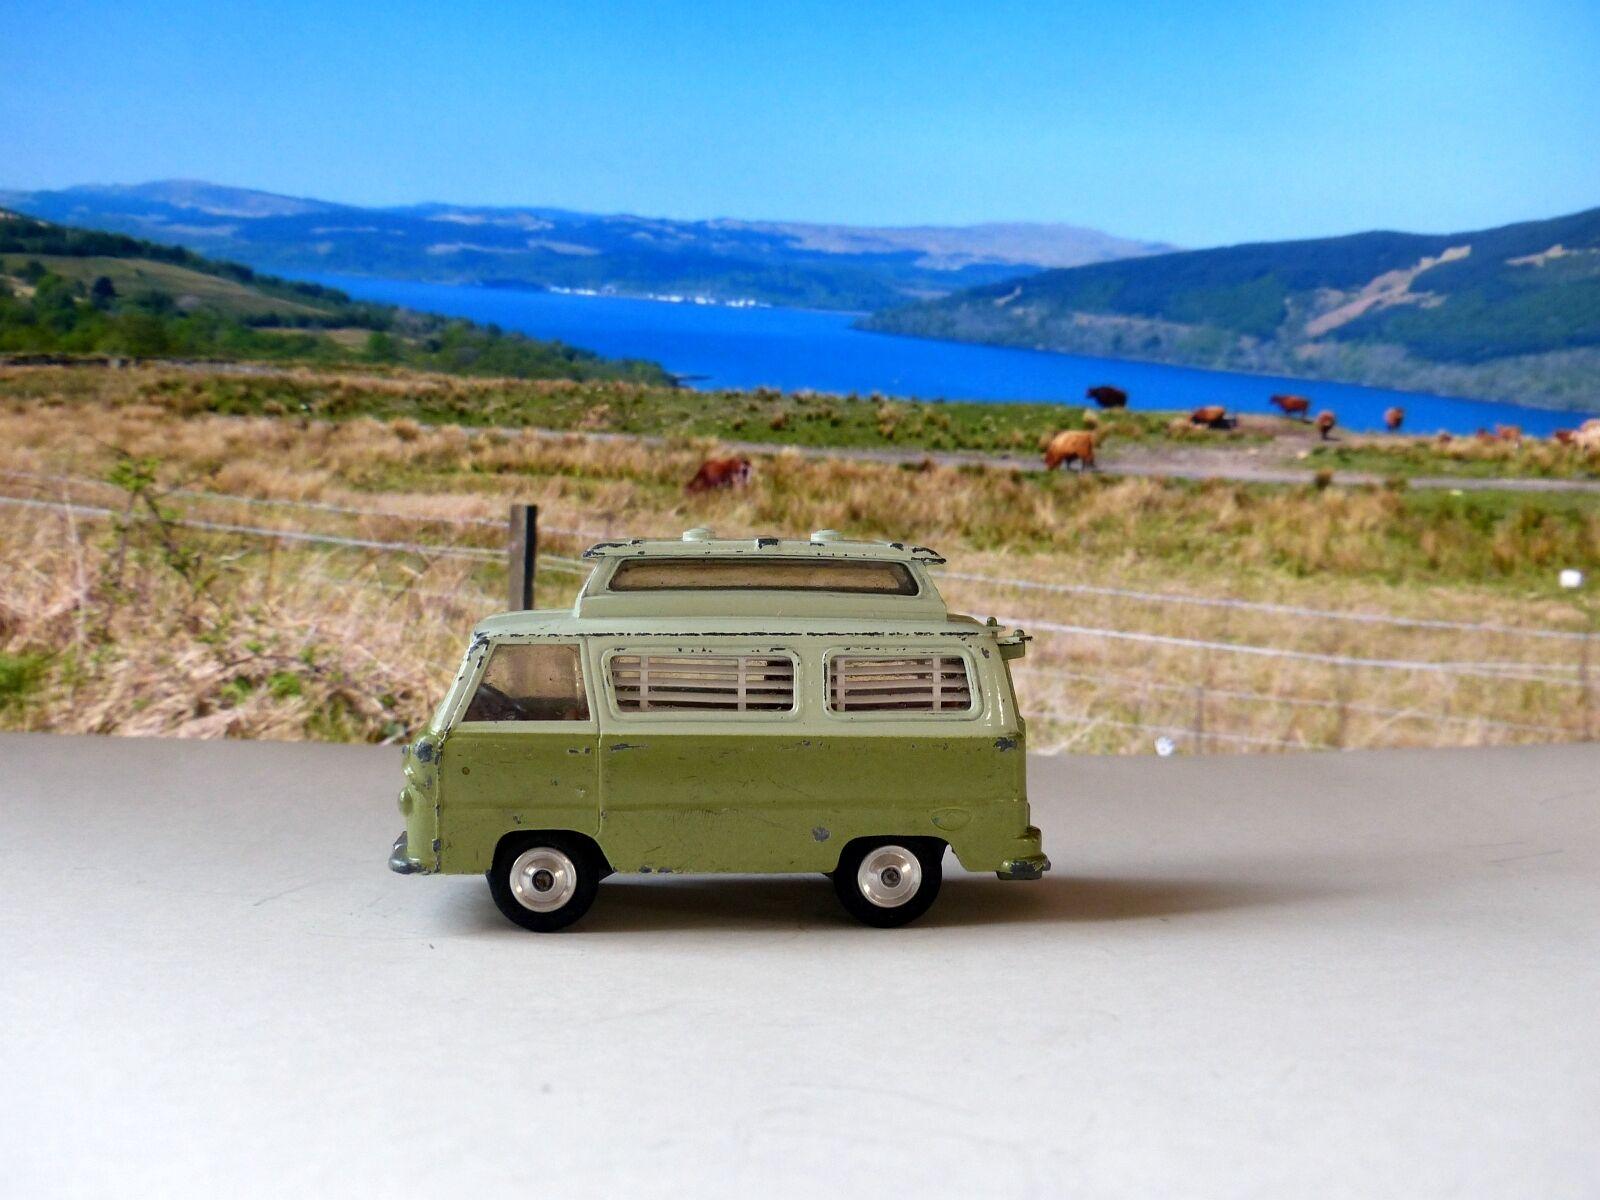 Corgi Toys 420 Thames 'Airborne' Caravan